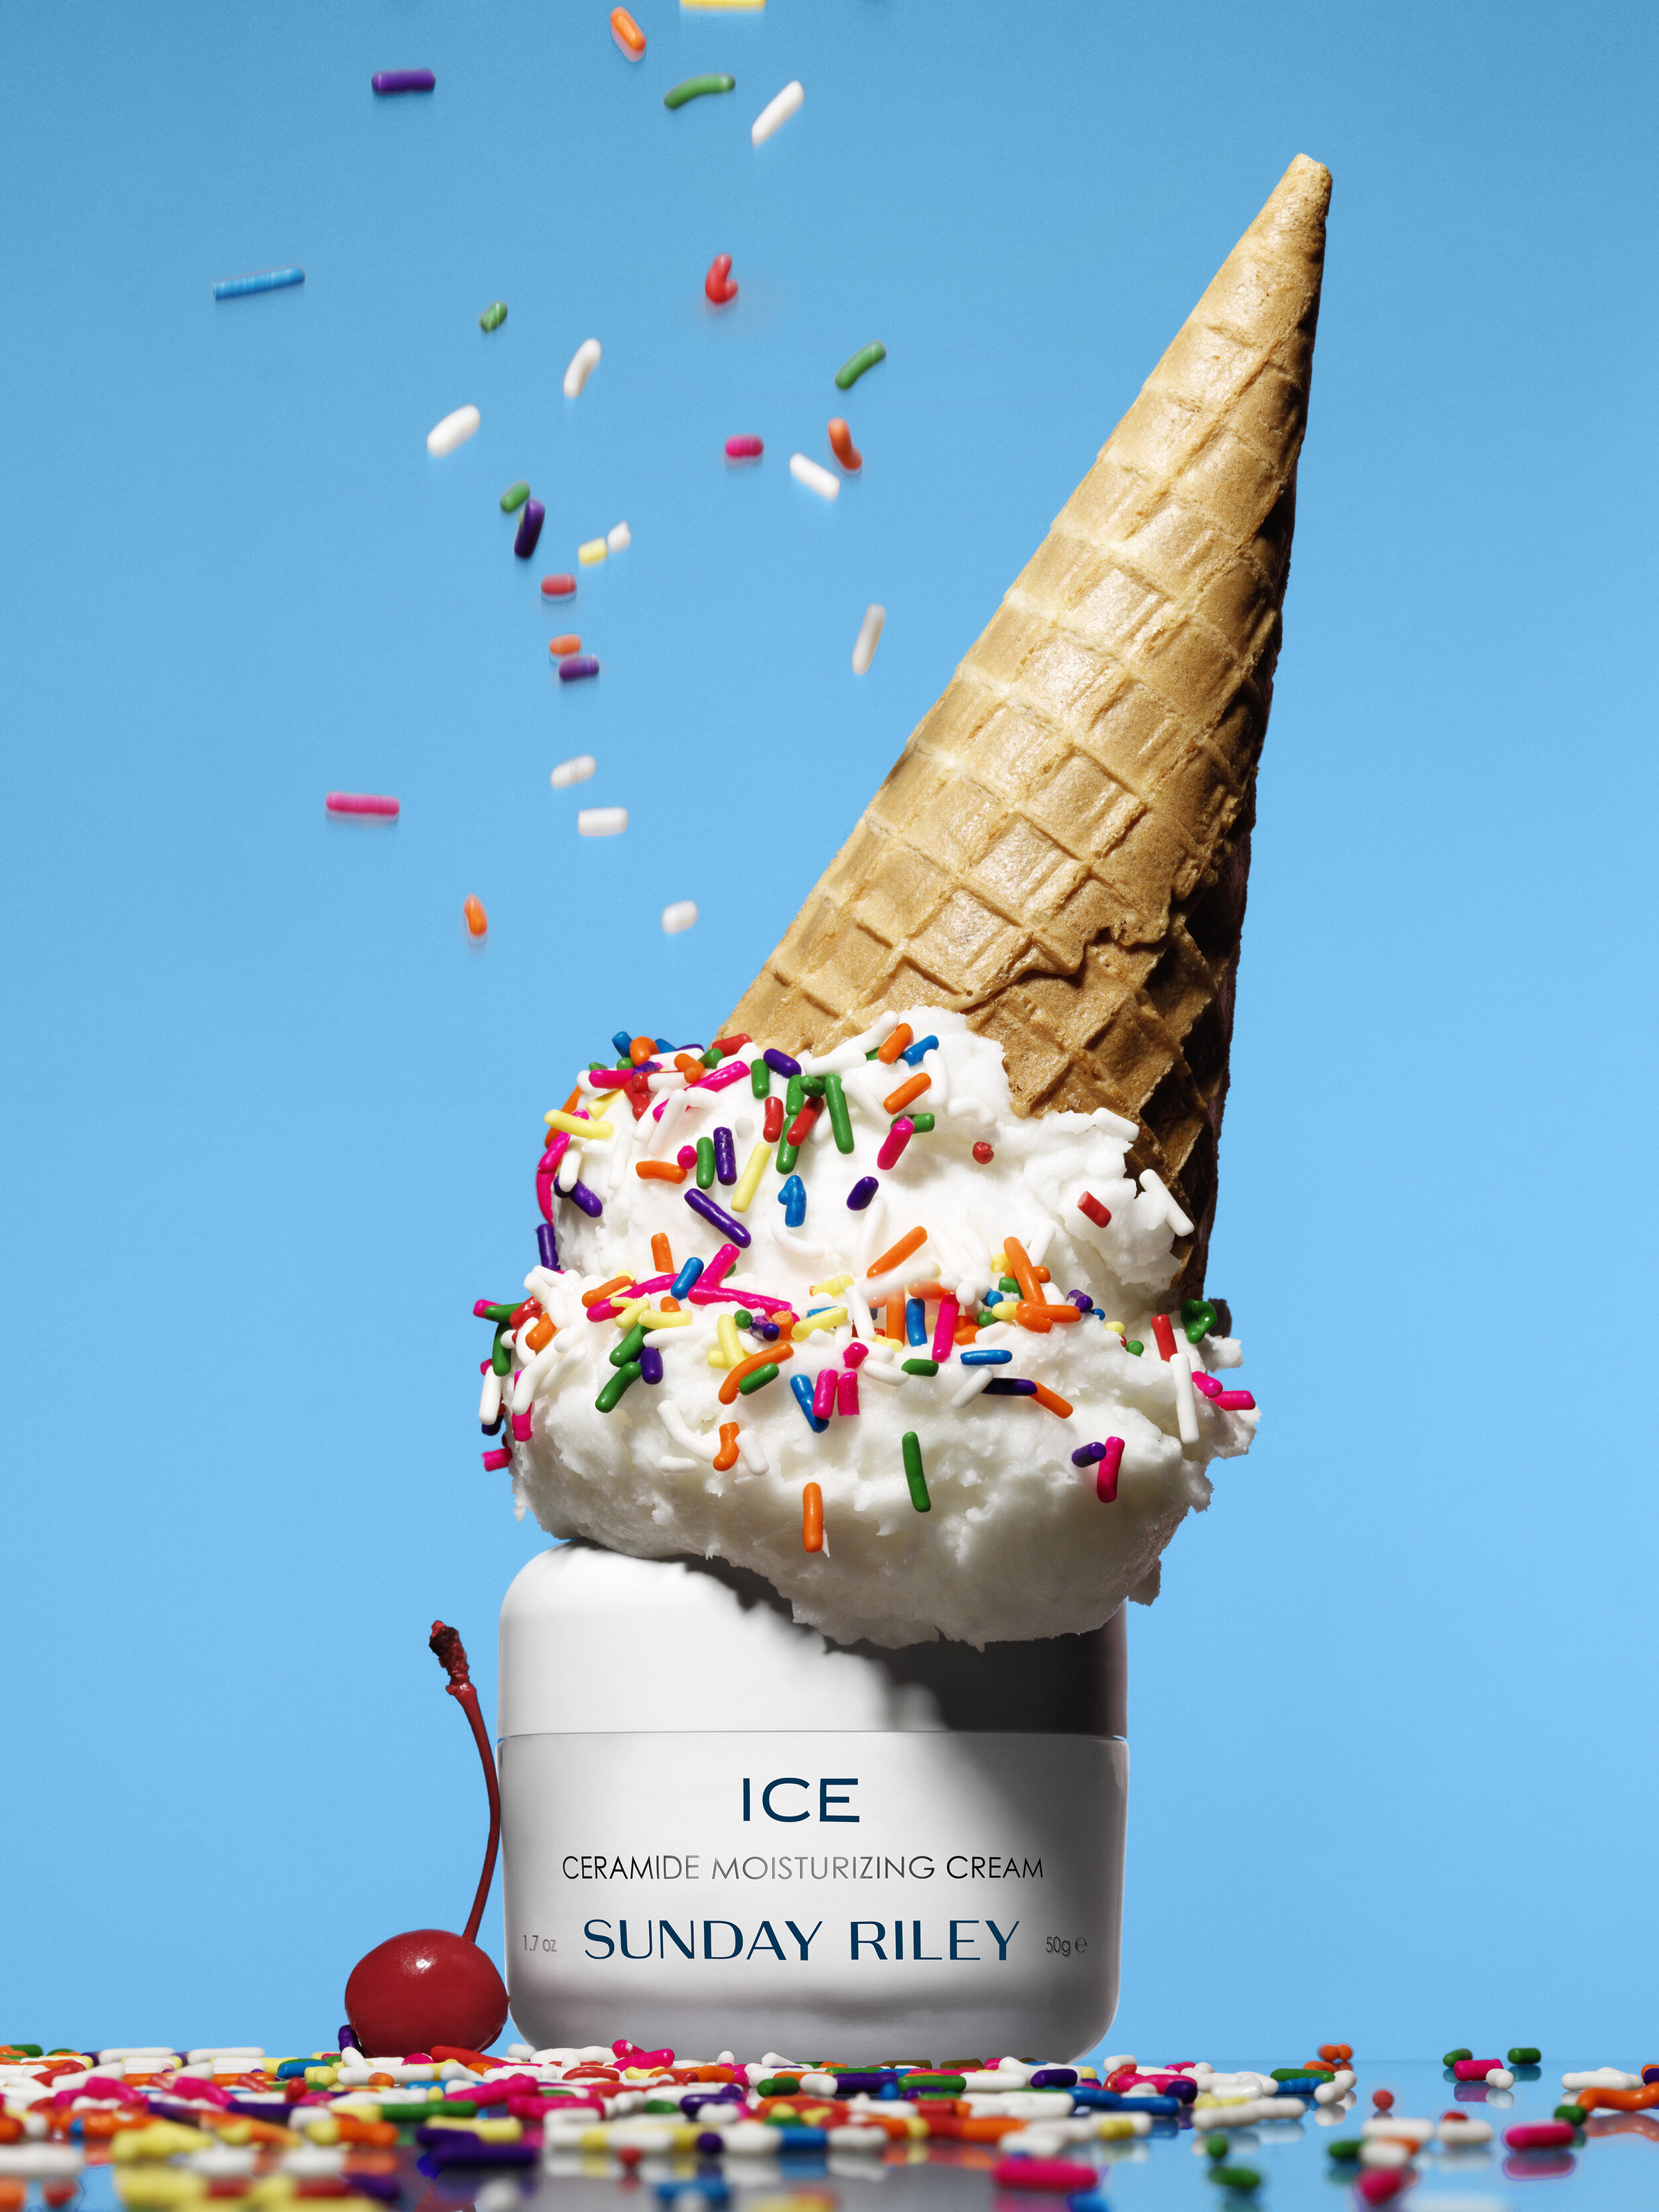 03_ice_cream_02_039_150dpi.jpg